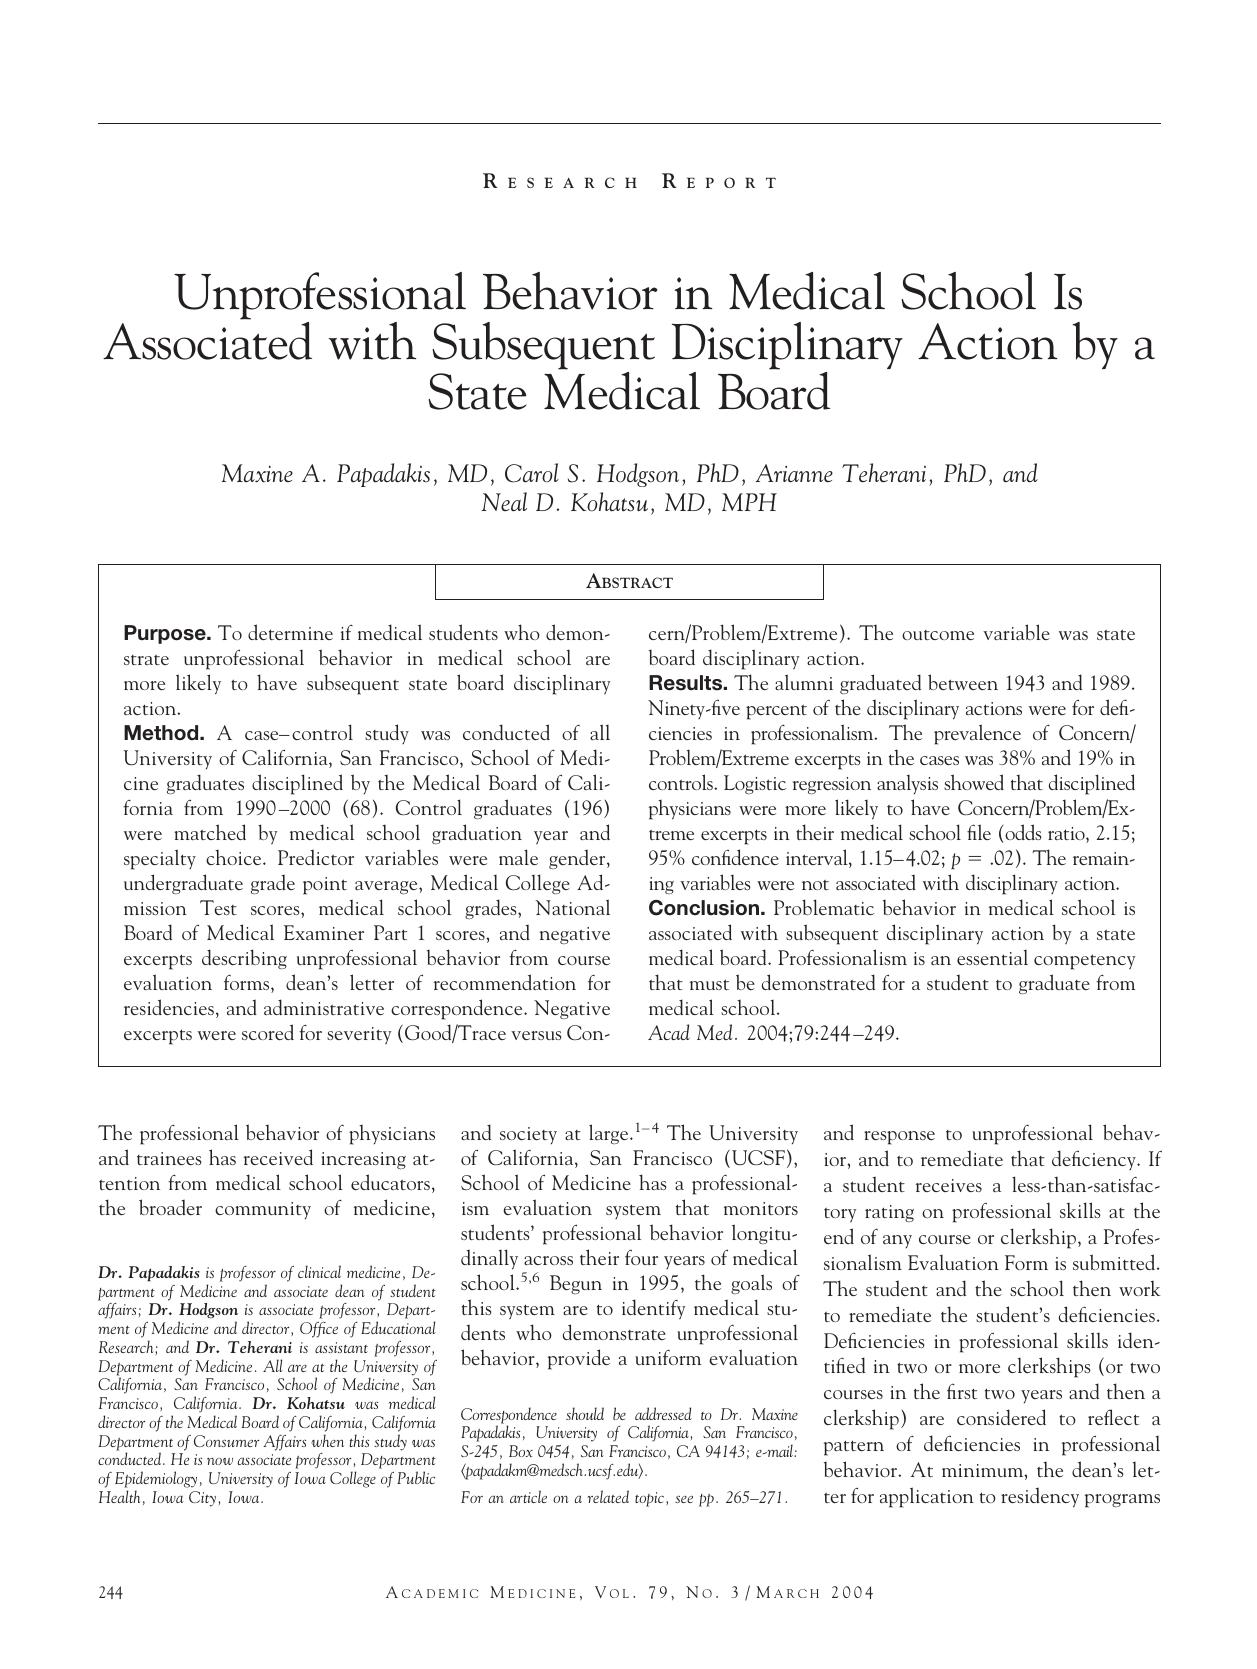 Unprofessional Behavior in Medical School Is State Medical Board